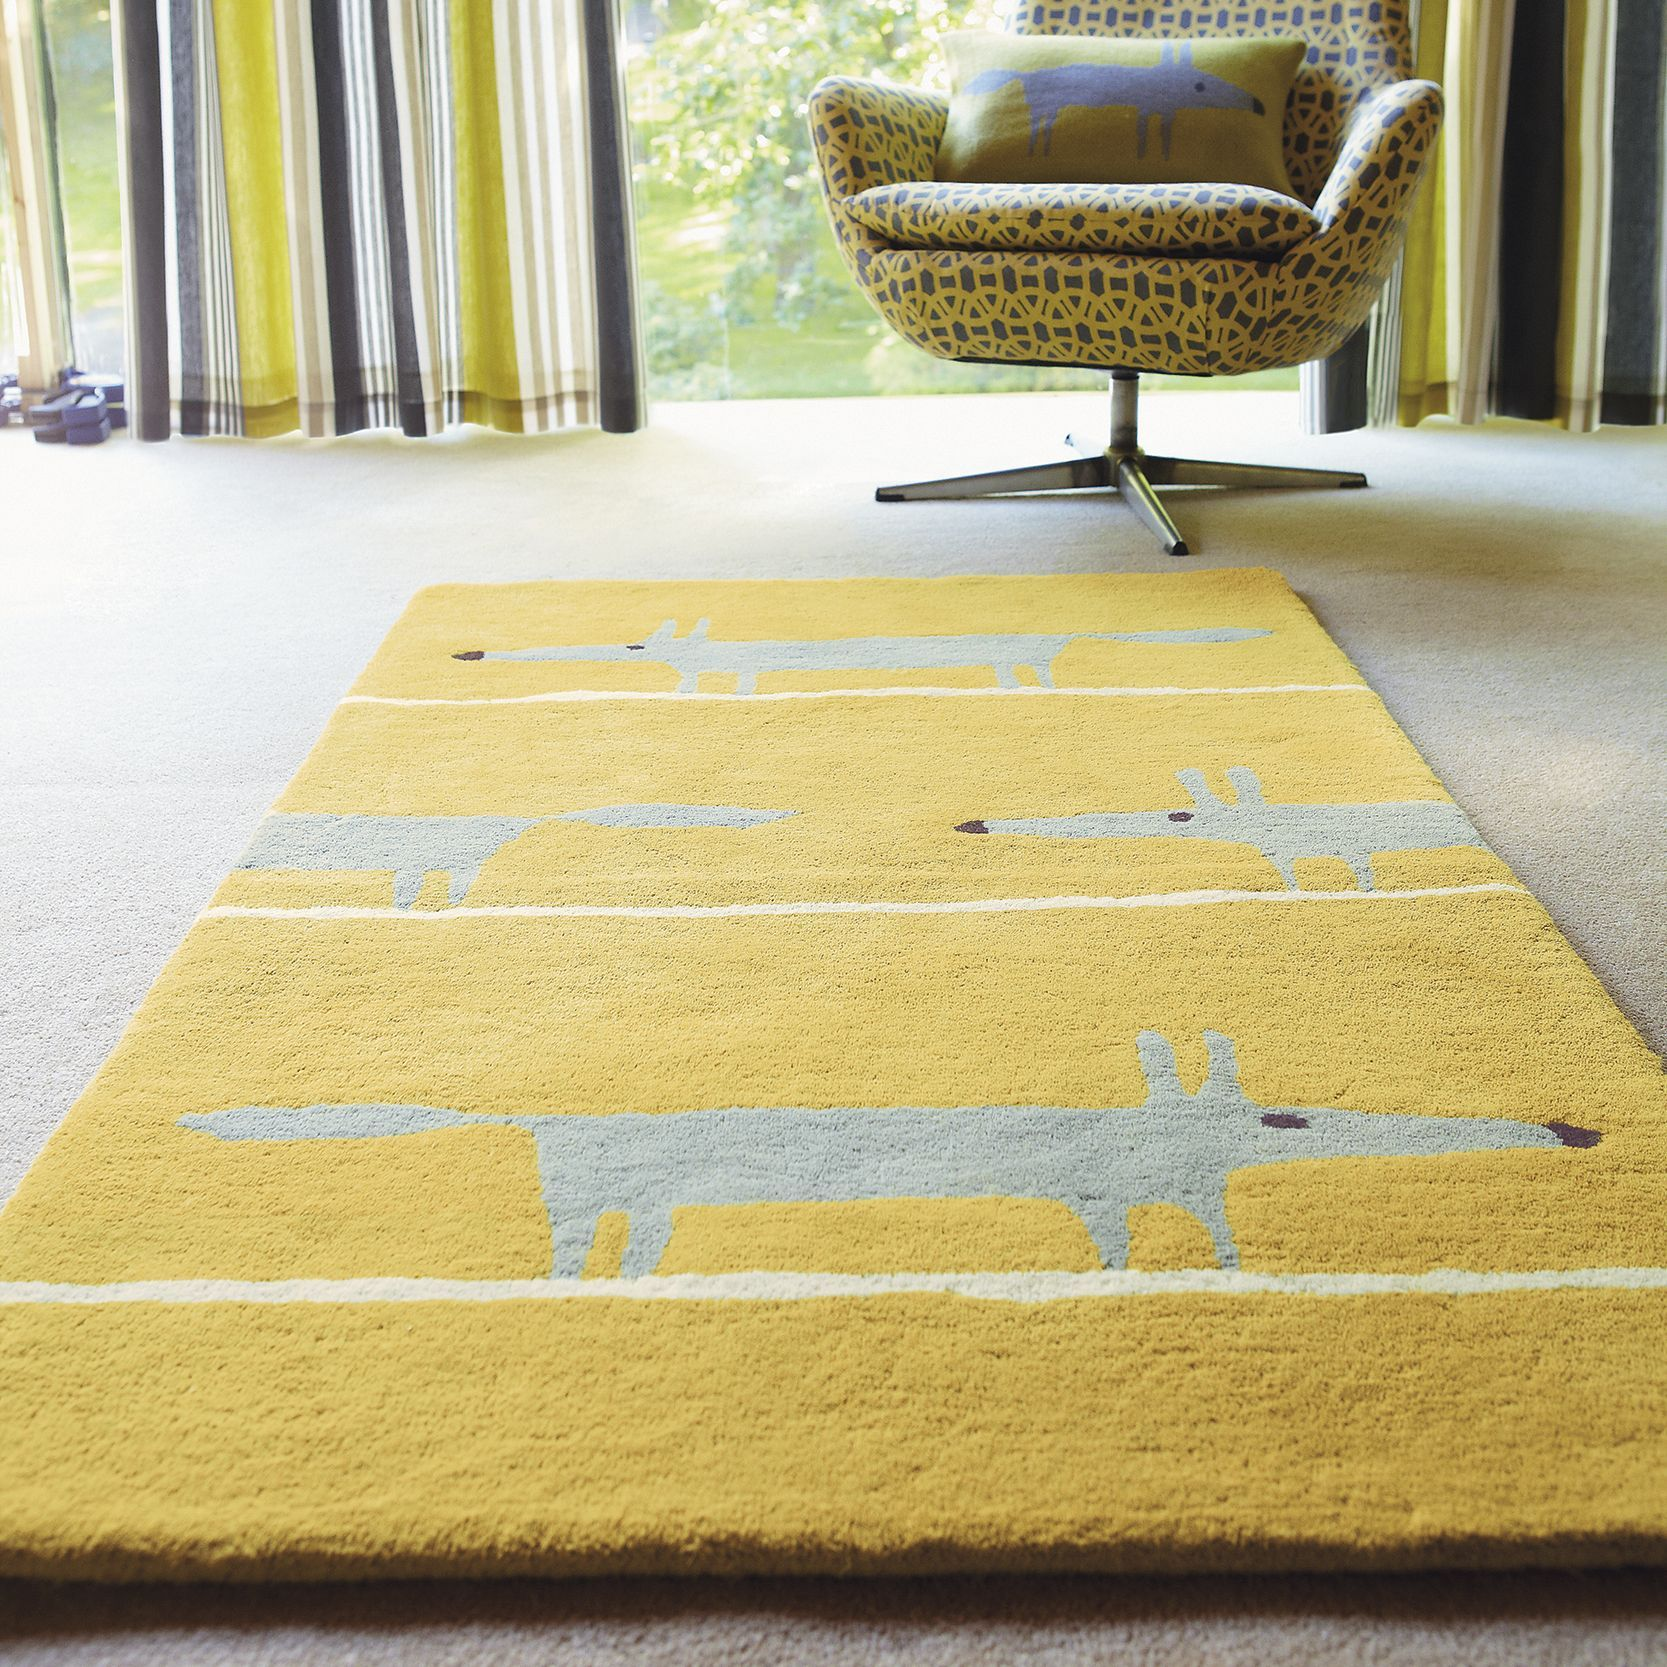 Scion Mr Fox Rug, Yellow, L200 x W140cm Fox rug, Scion